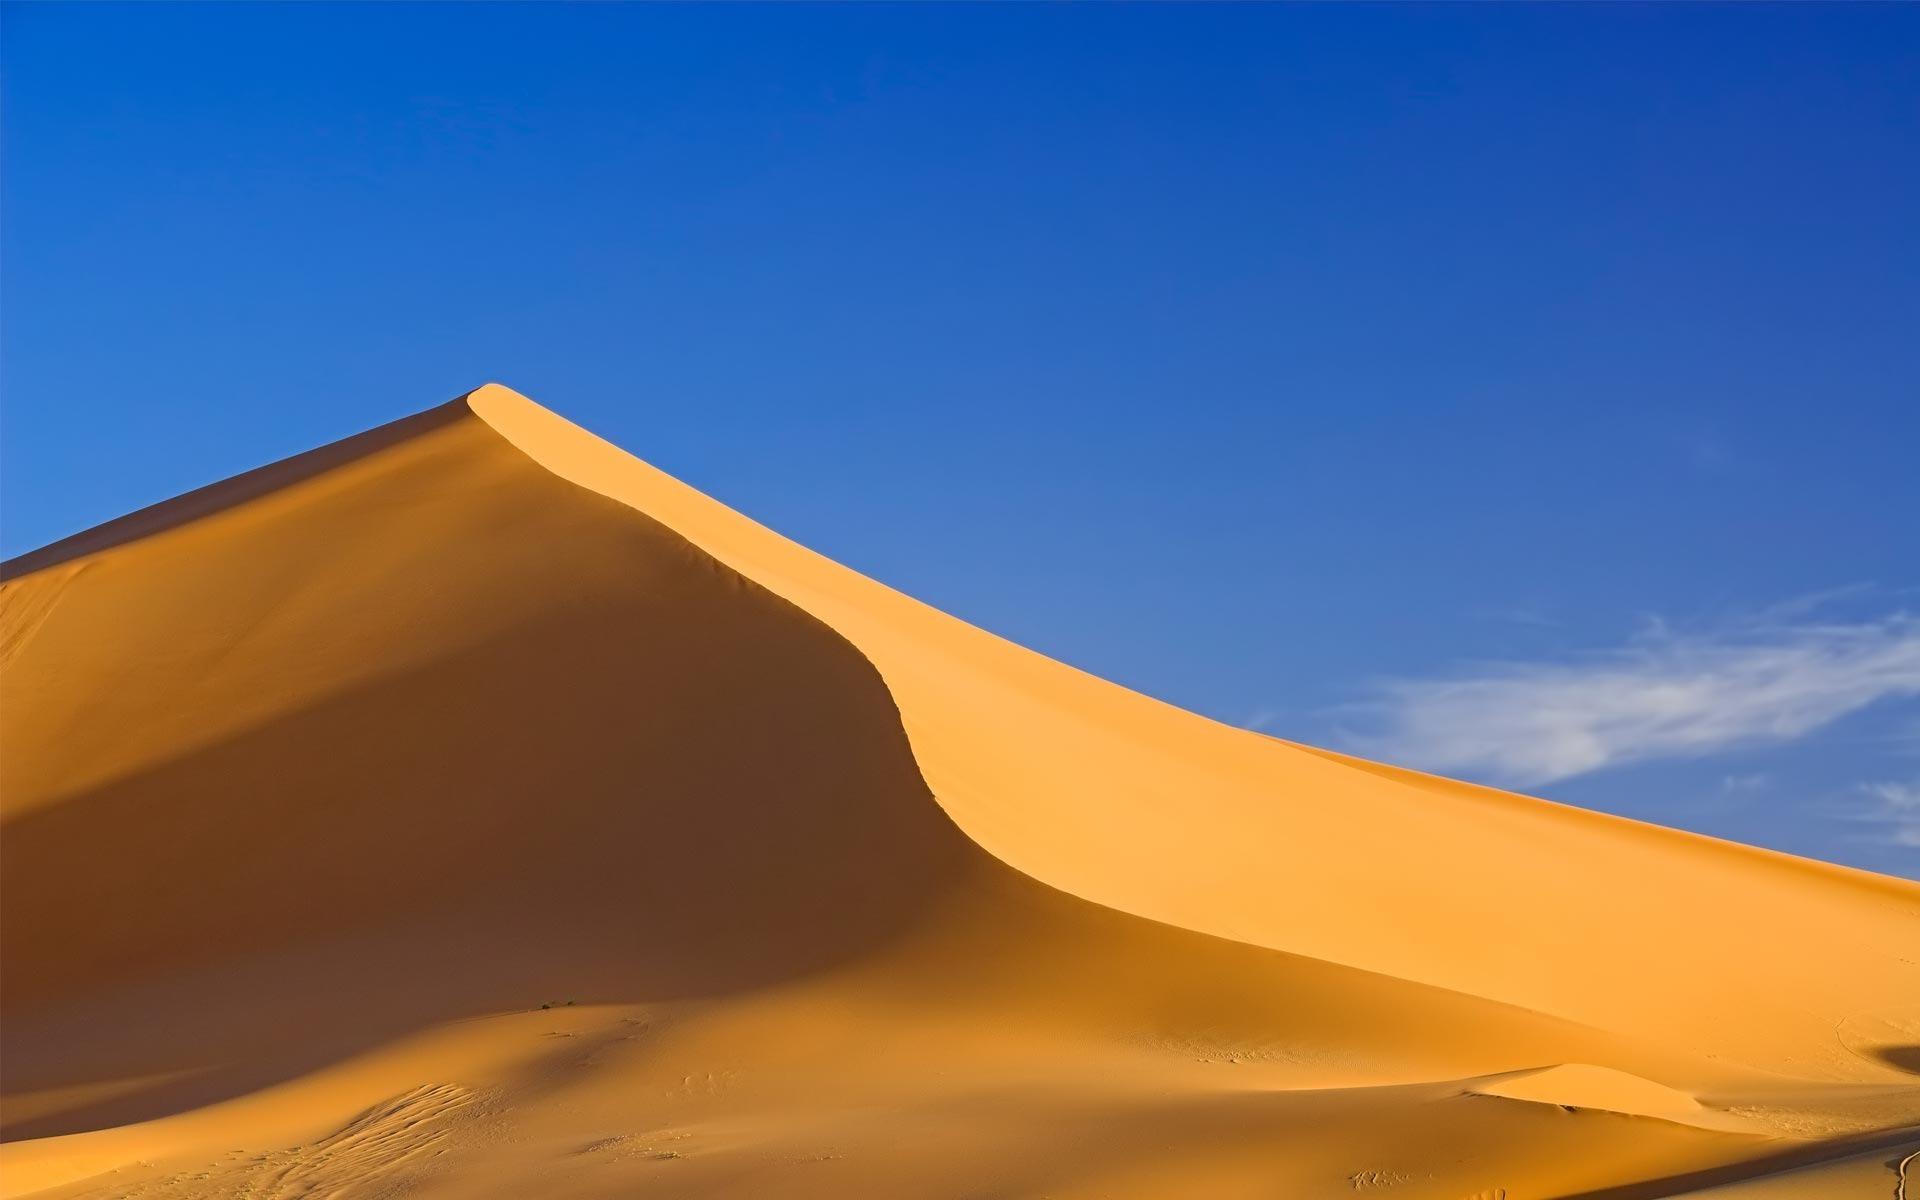 sand dunes wallpaper background